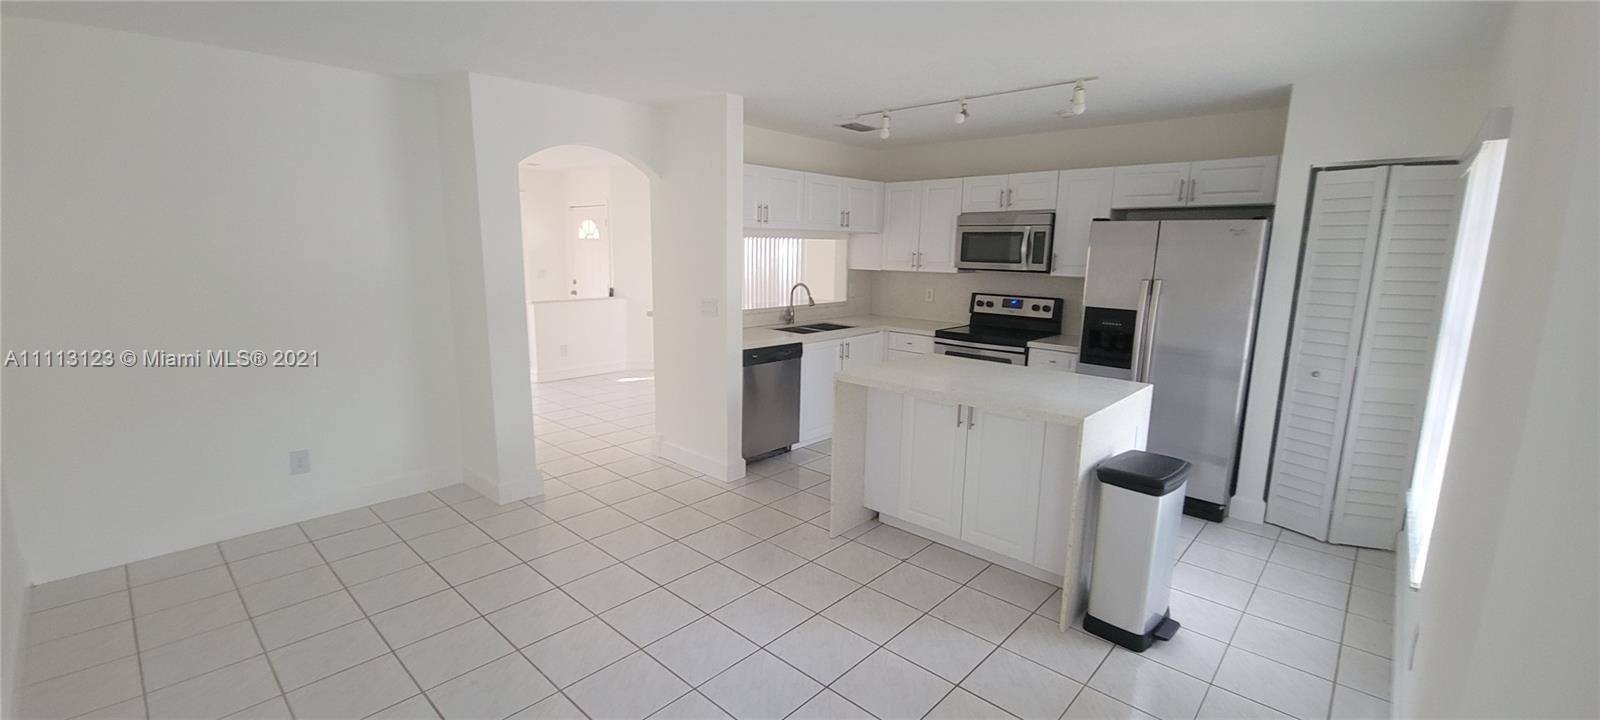 Photo of Weston, FL 33326 (MLS # A11113123)